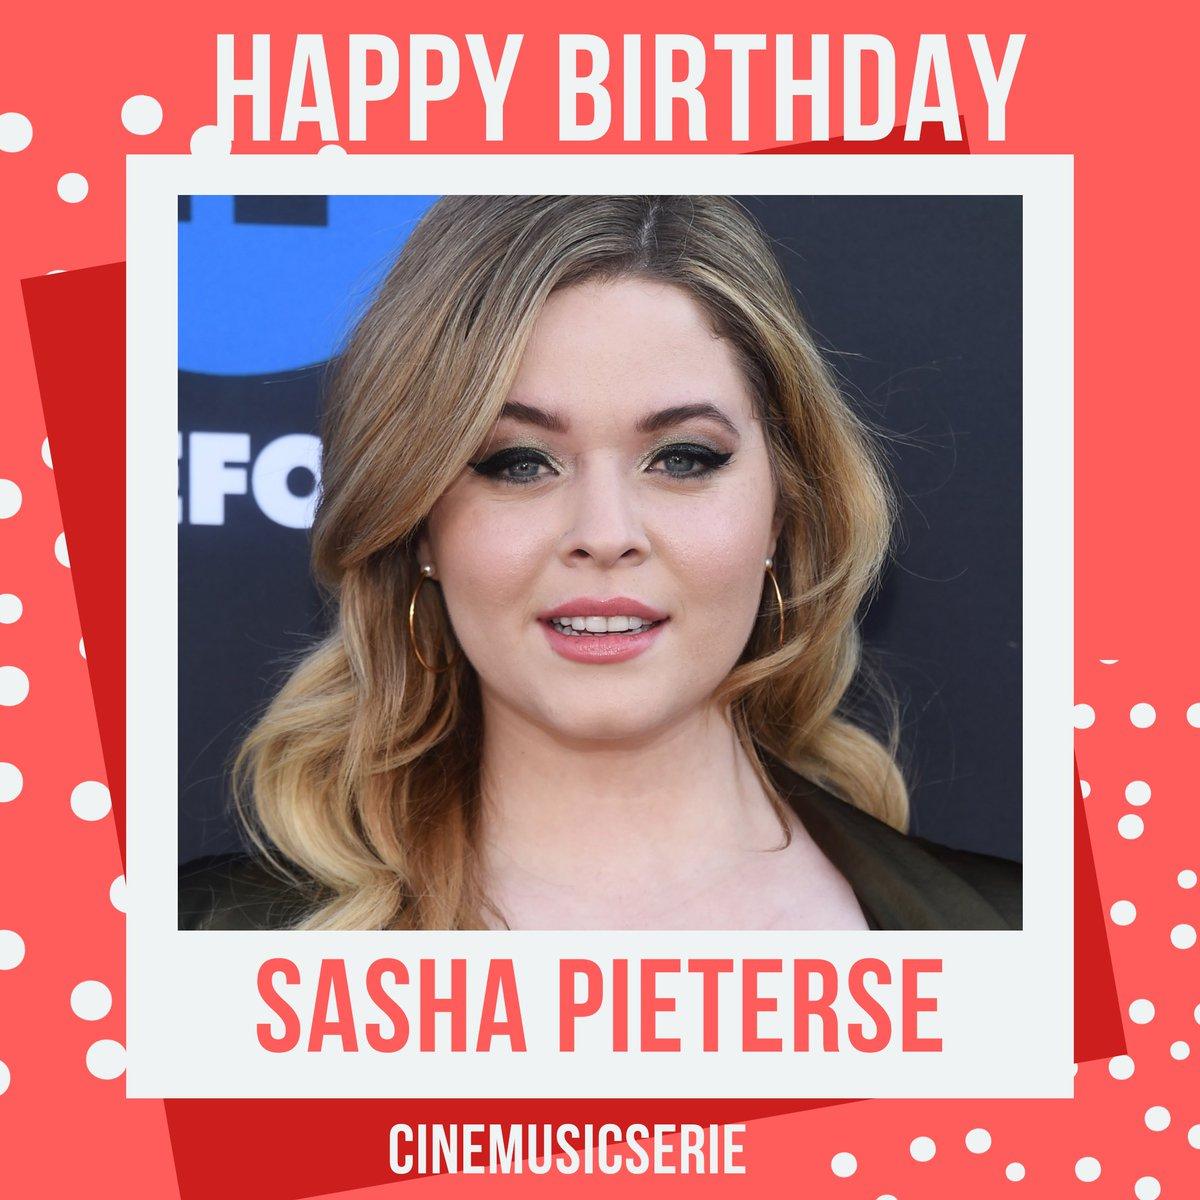 #HappyBirthday @SashaPieterse completa 24 anos hoje .